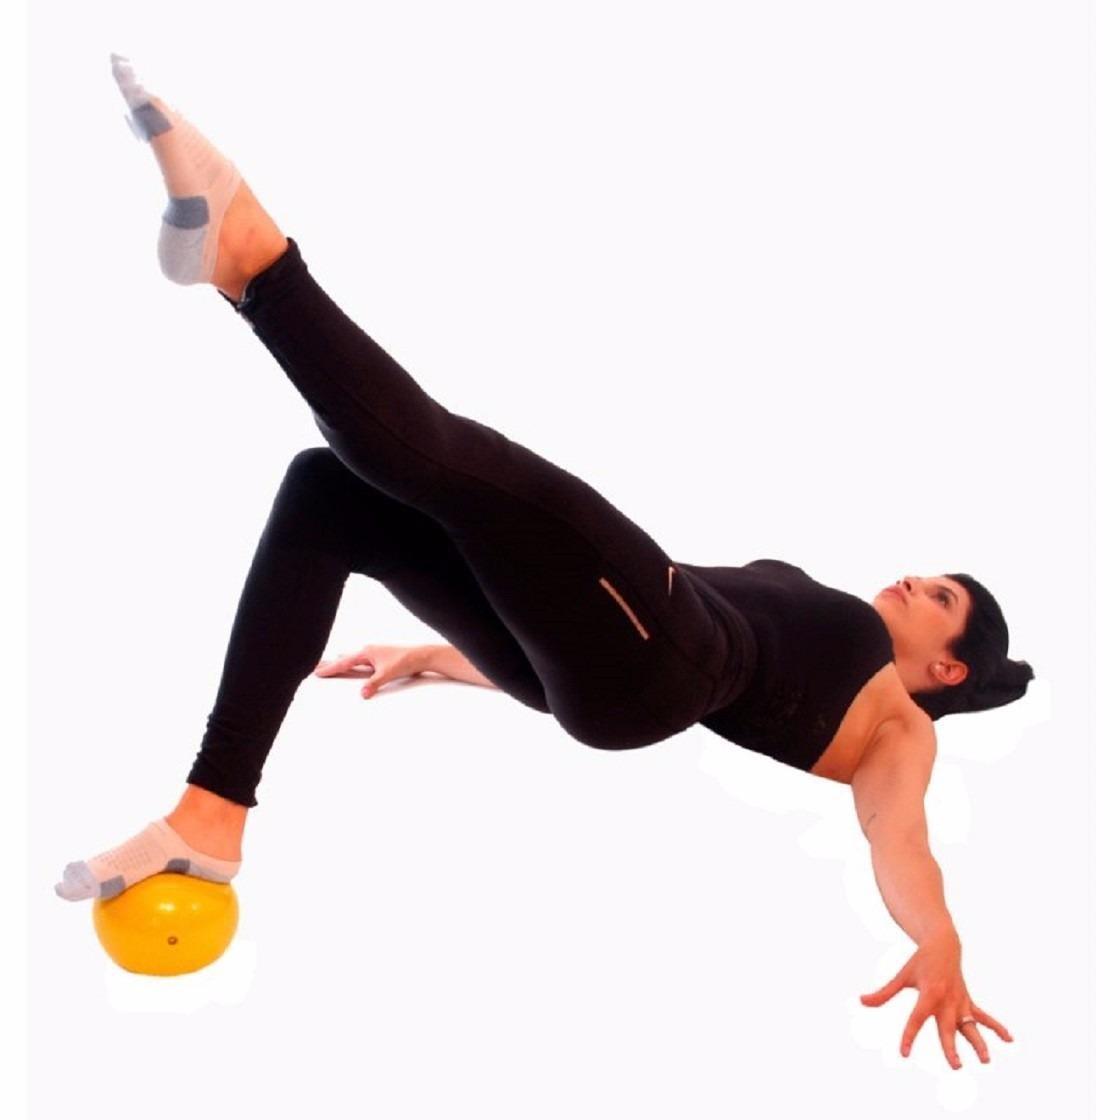 Bola Liveup Pilates Overball Funcional Academia 25 cm - Laranja ... f2d4de3e6b0a7